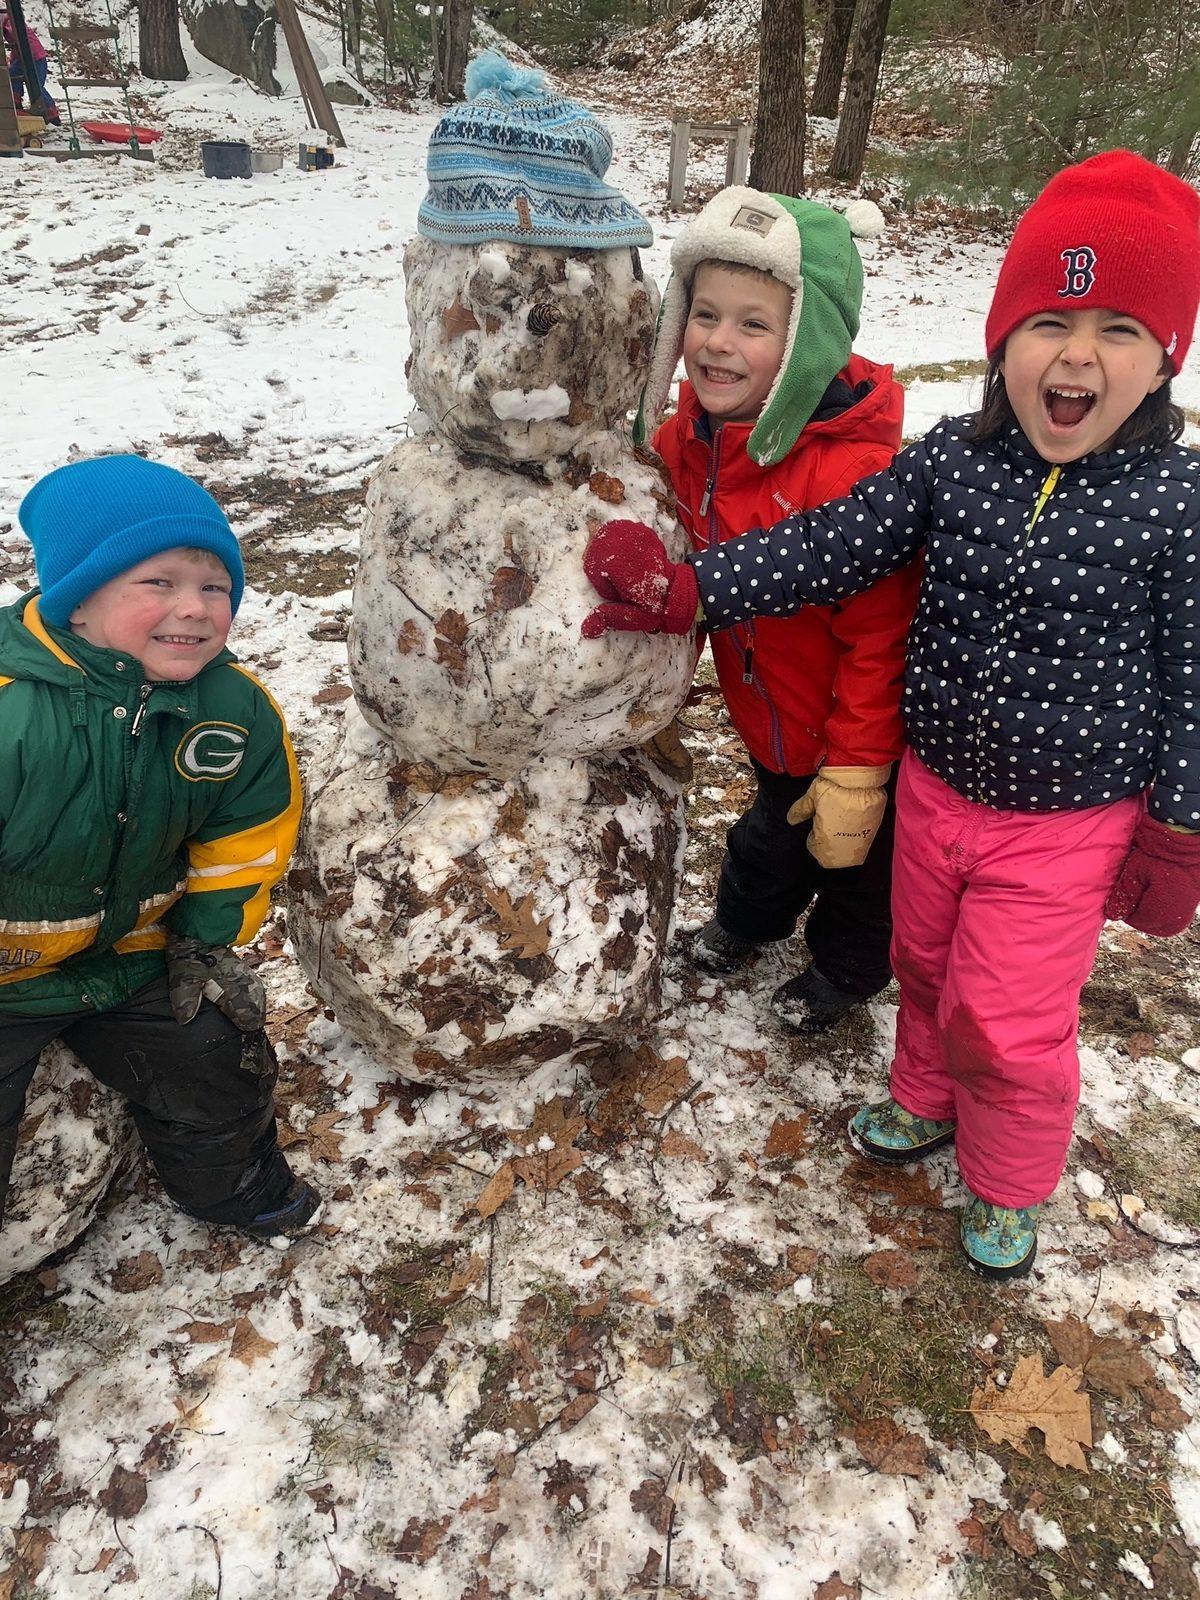 PreK Laugh Learn 3 Week 3 Winter Games 2021 Moment of the Week